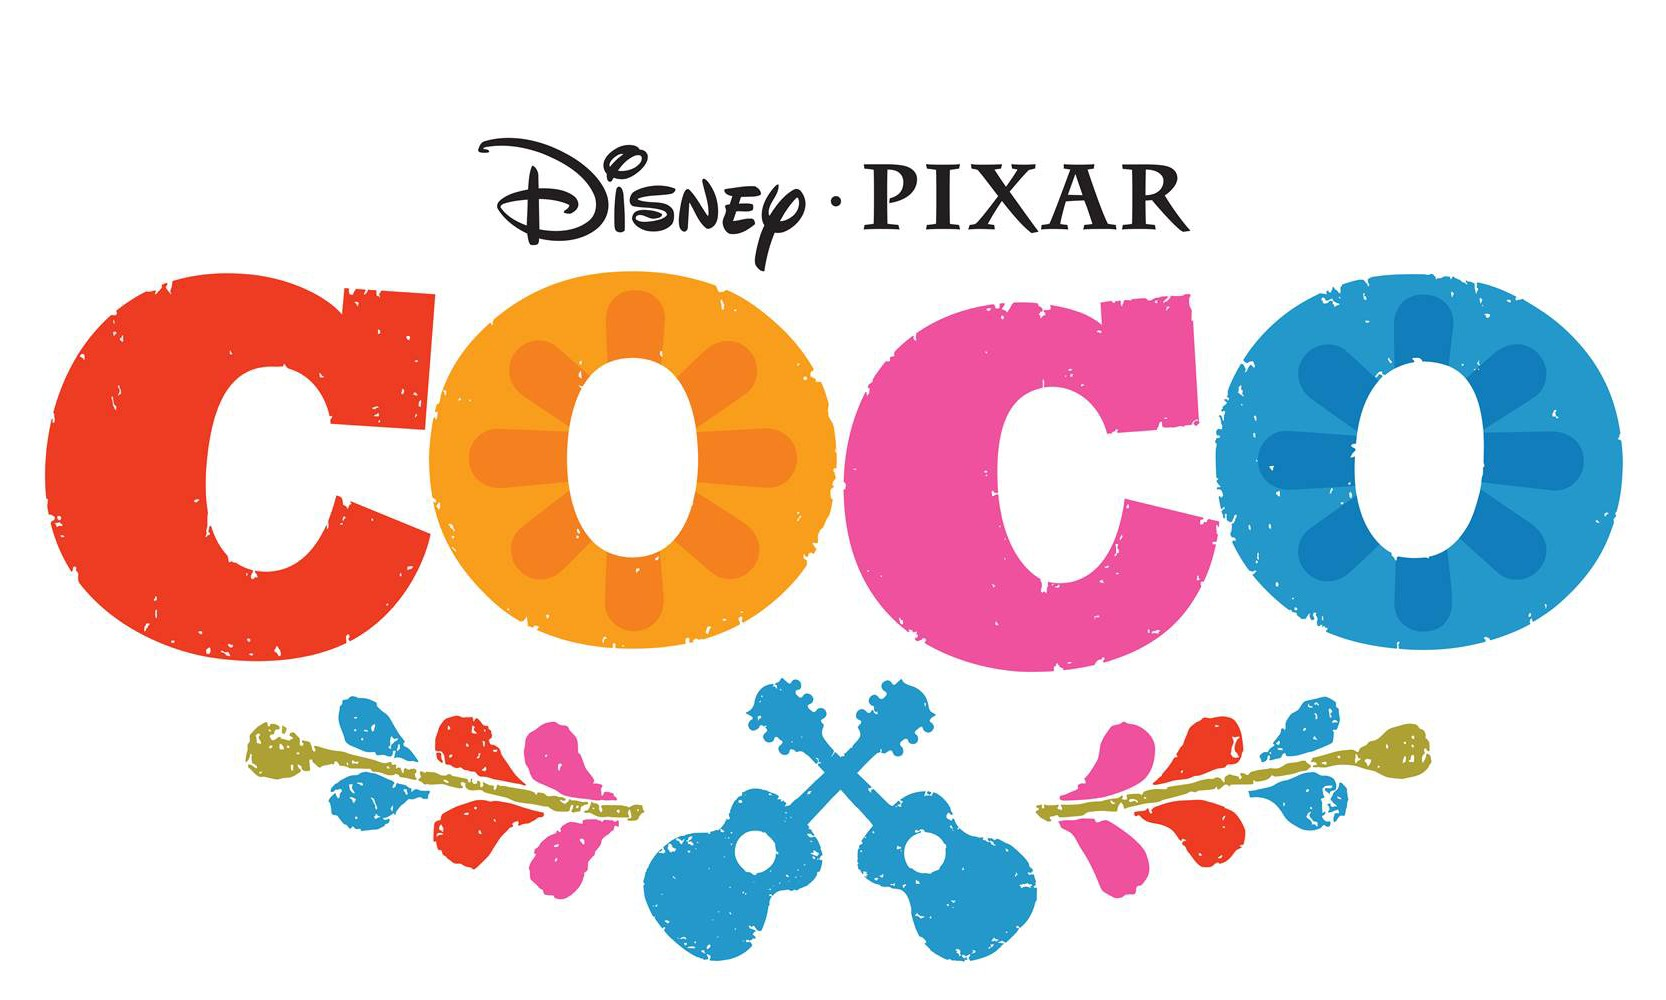 Disney Pixar 再出新片,《Coco》第一部预告片发布